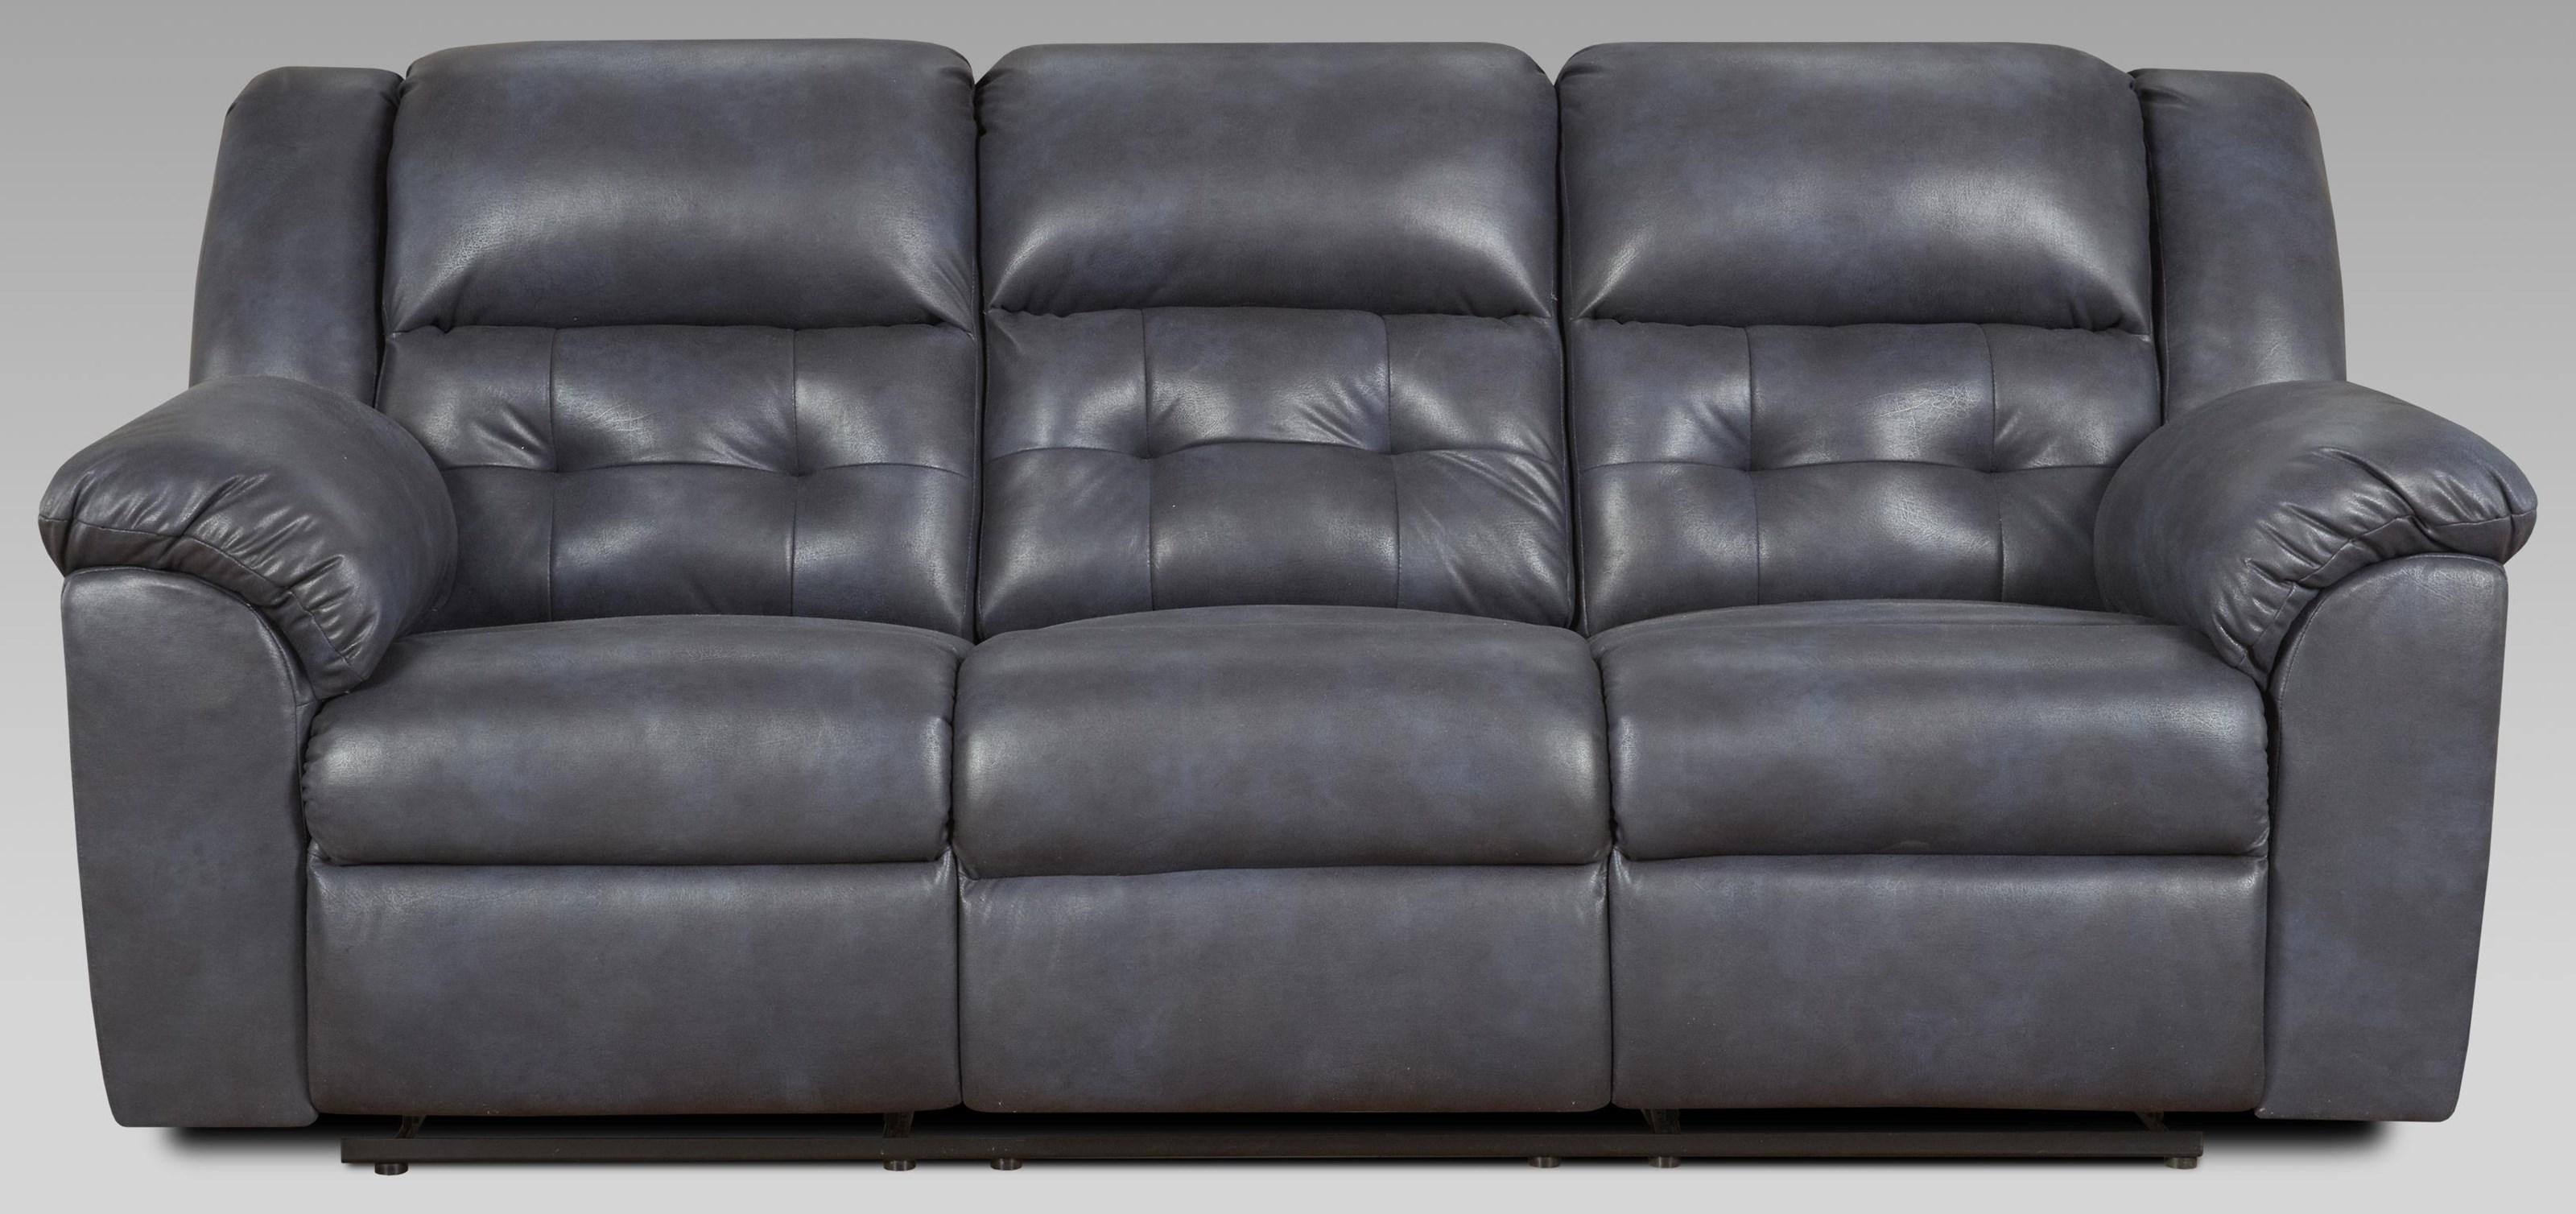 2550 Telluride Indigo Dual Reclining Sofa by Affordable Furniture at Furniture Fair - North Carolina